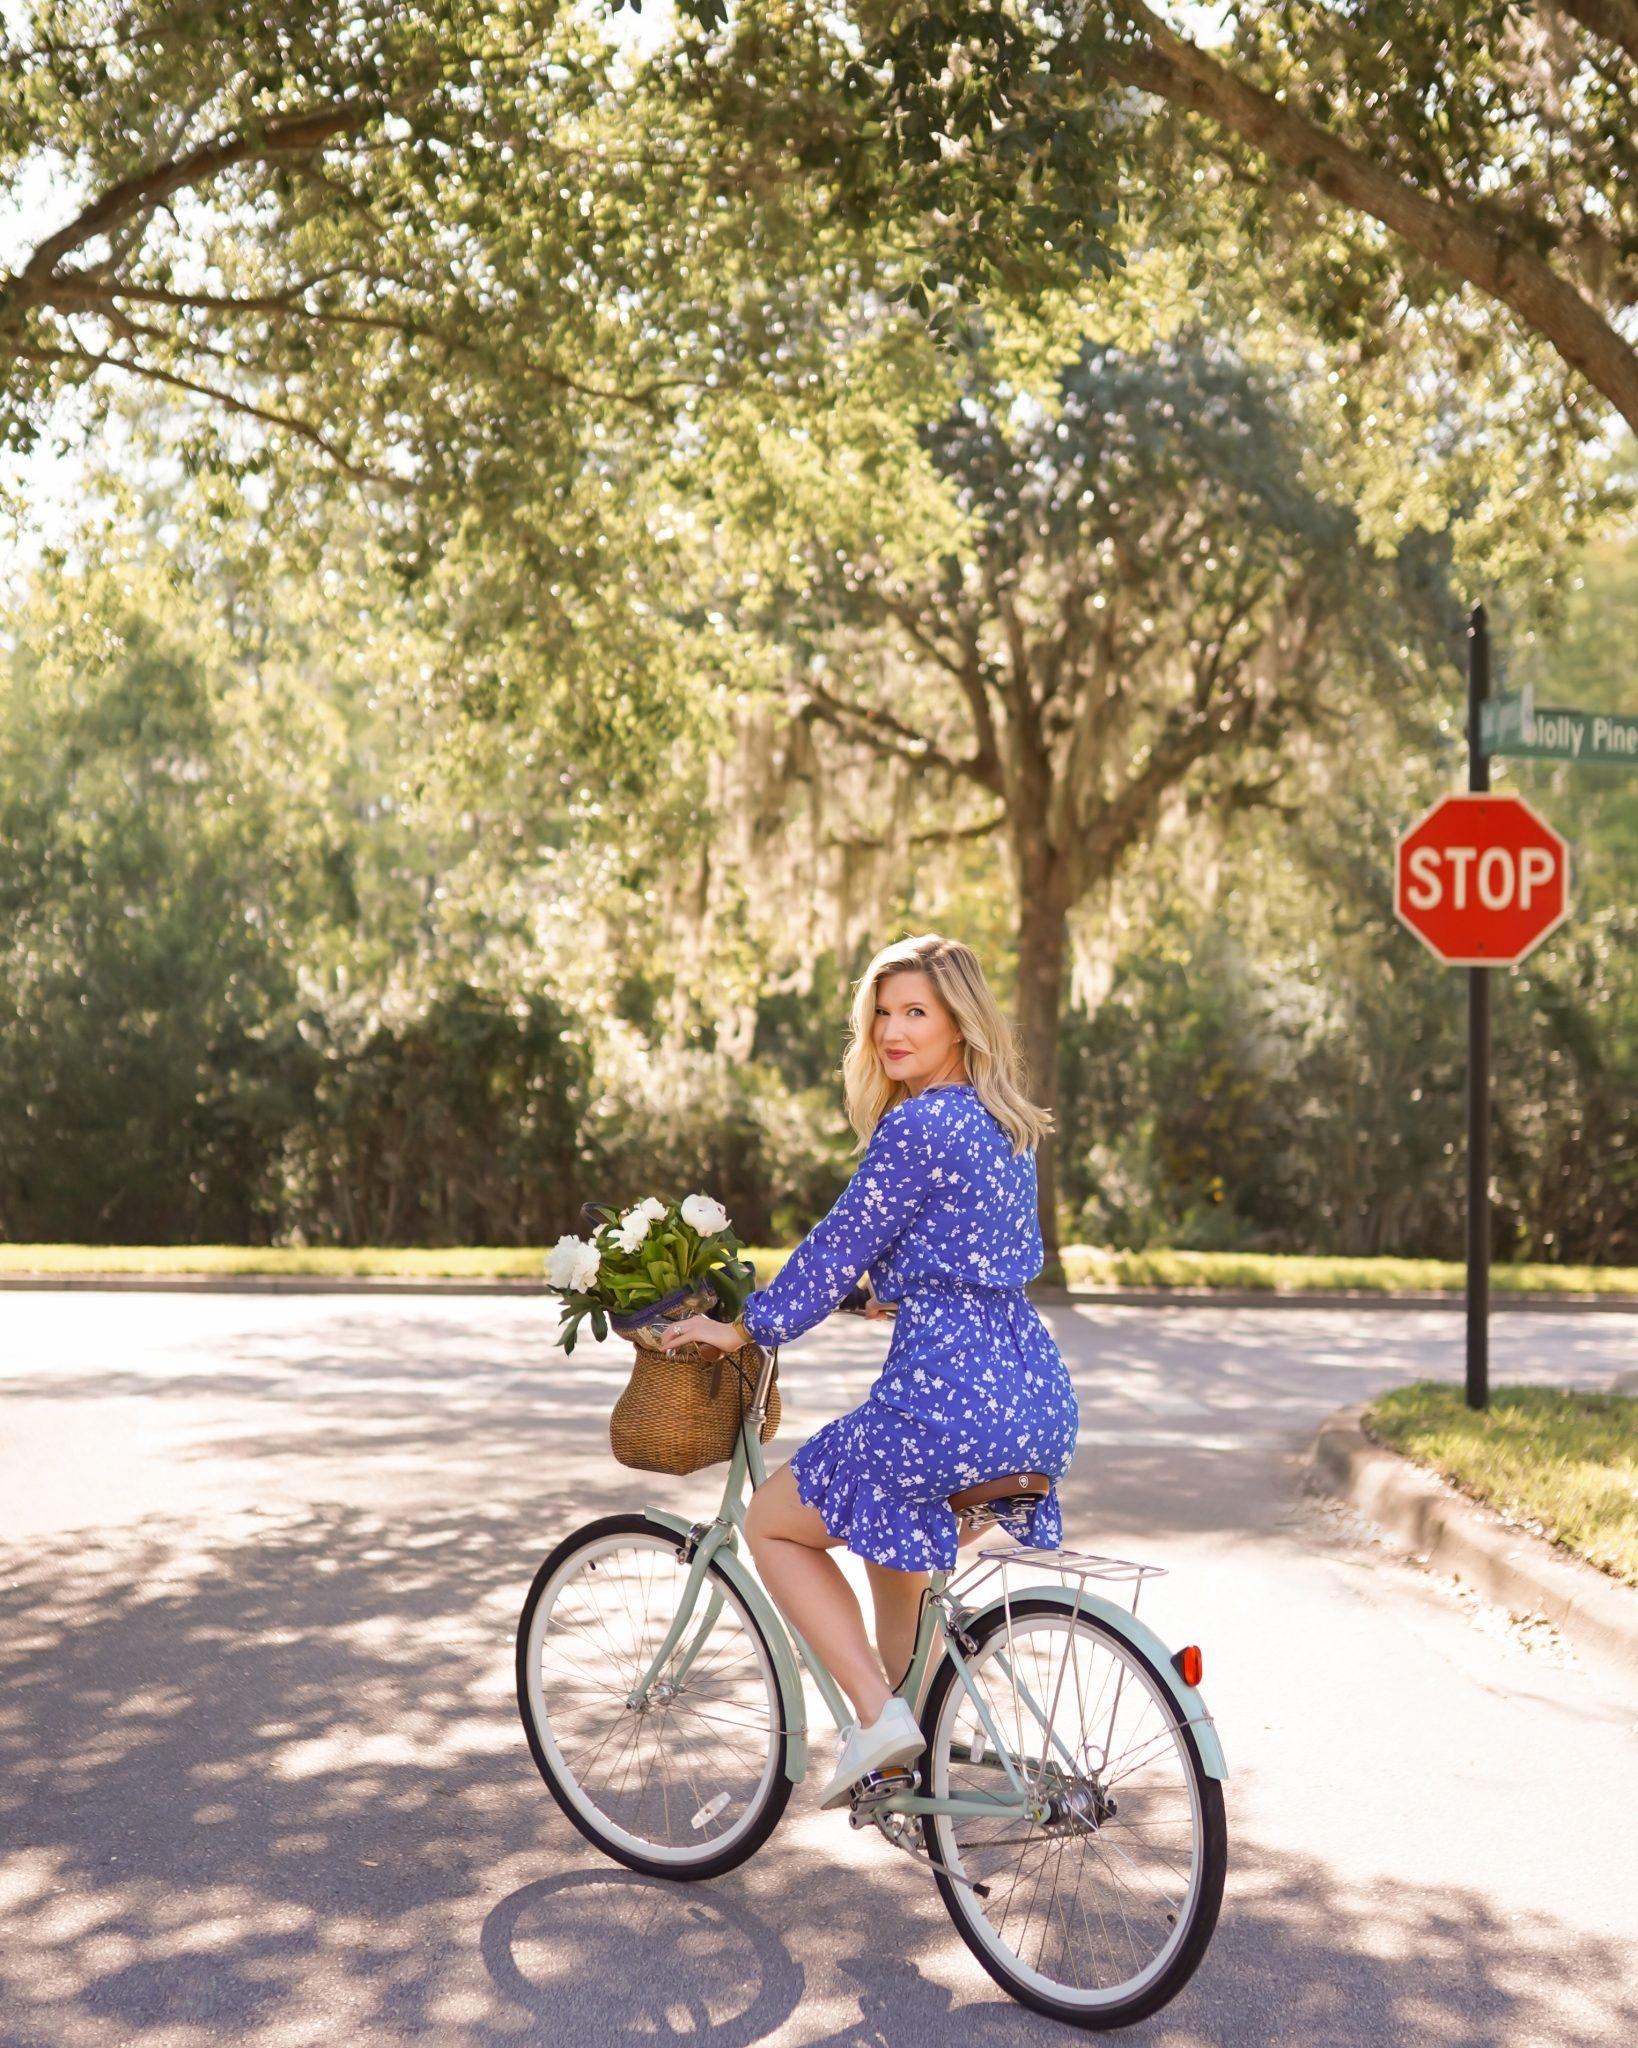 Ashley Brooke - Draper James - Floral Popover Dress - 6 -c 2